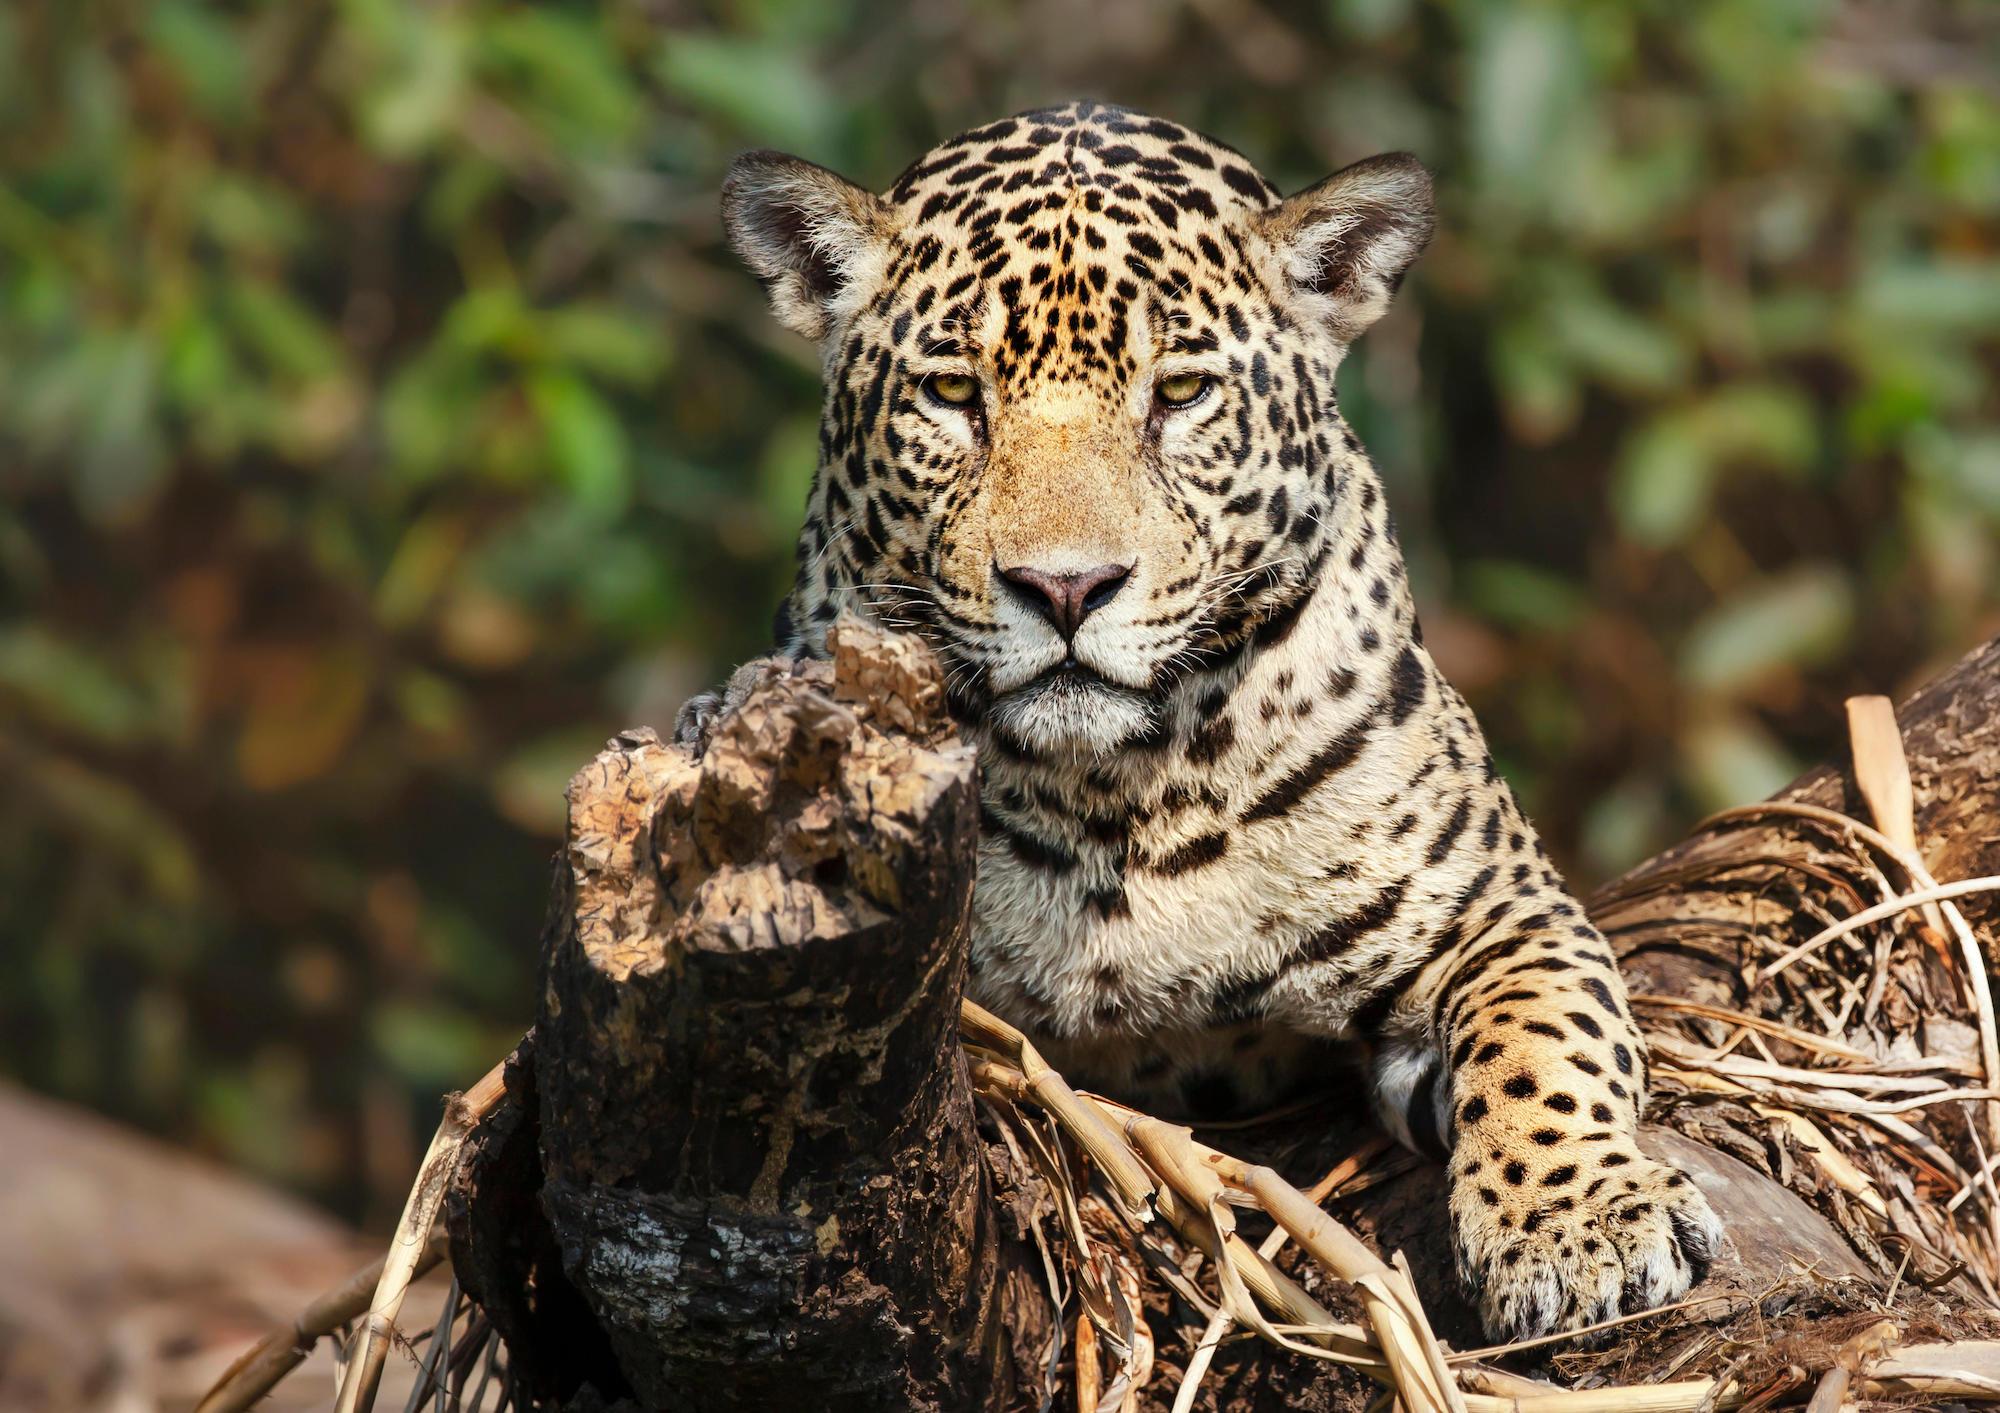 A jaguar on a fallen tree in thePantanal, Brazil(Image: Alamy)